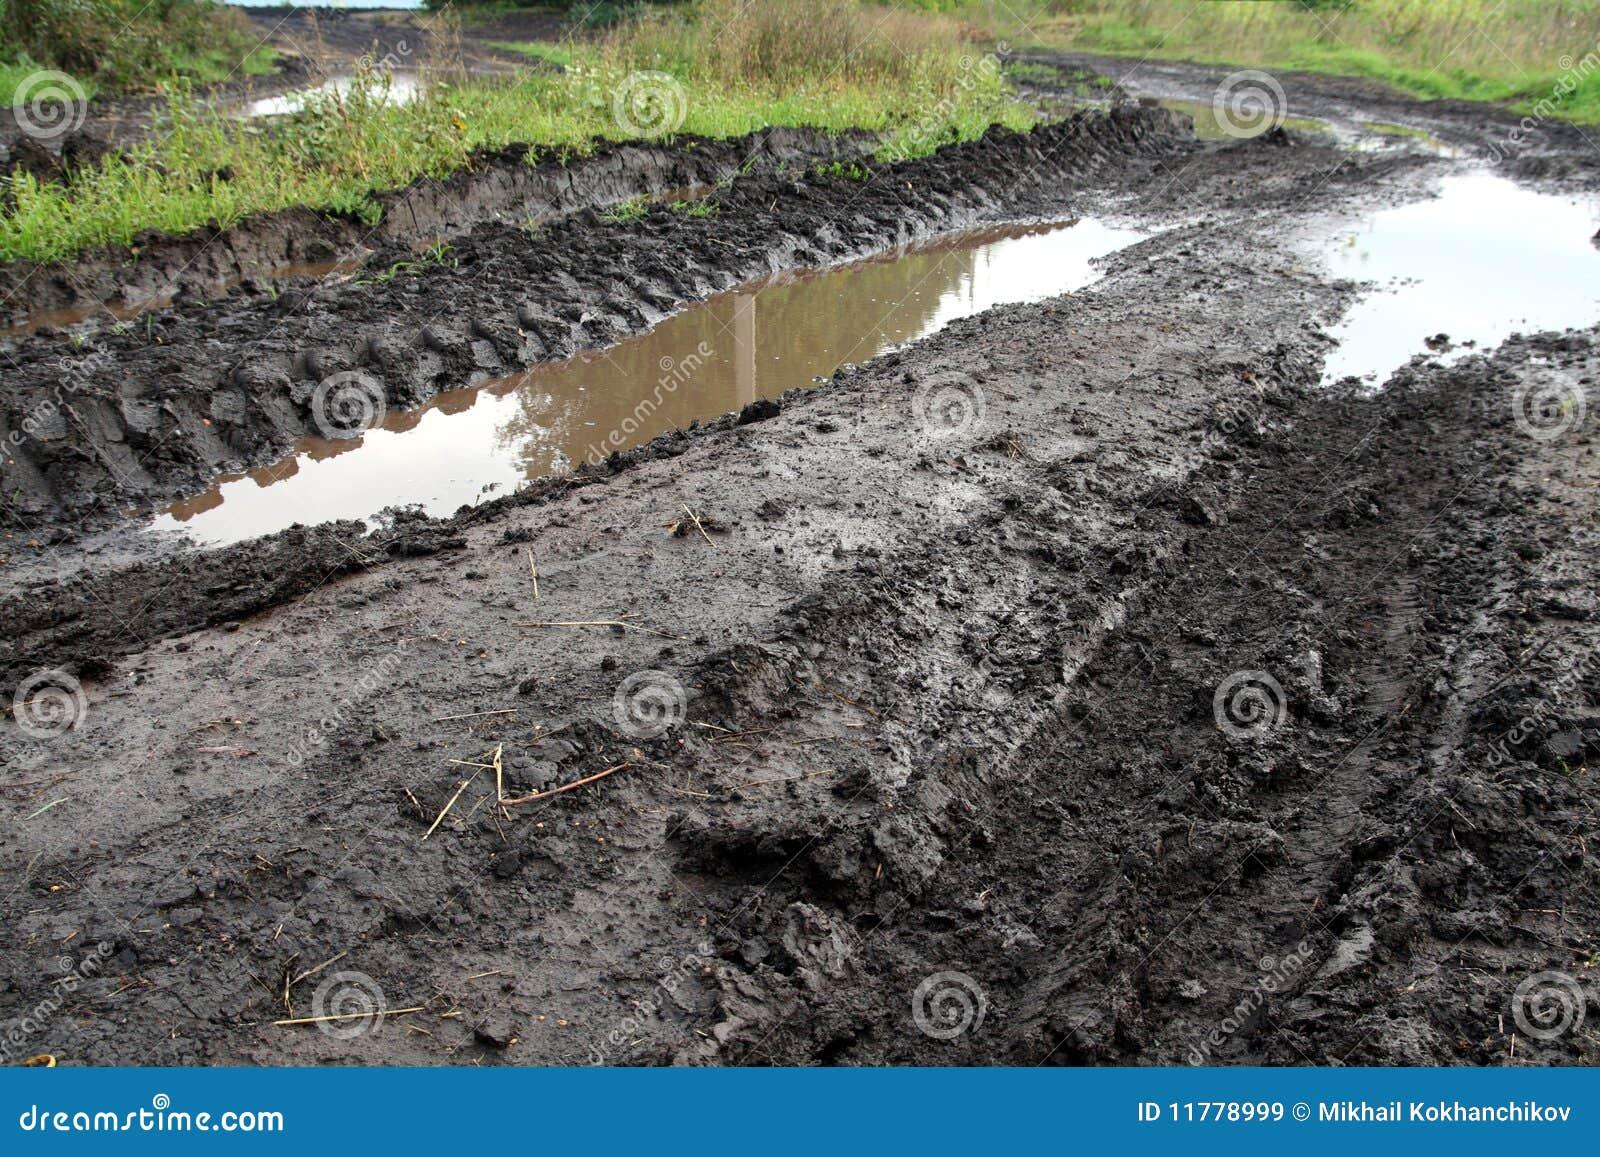 Mud dirty road